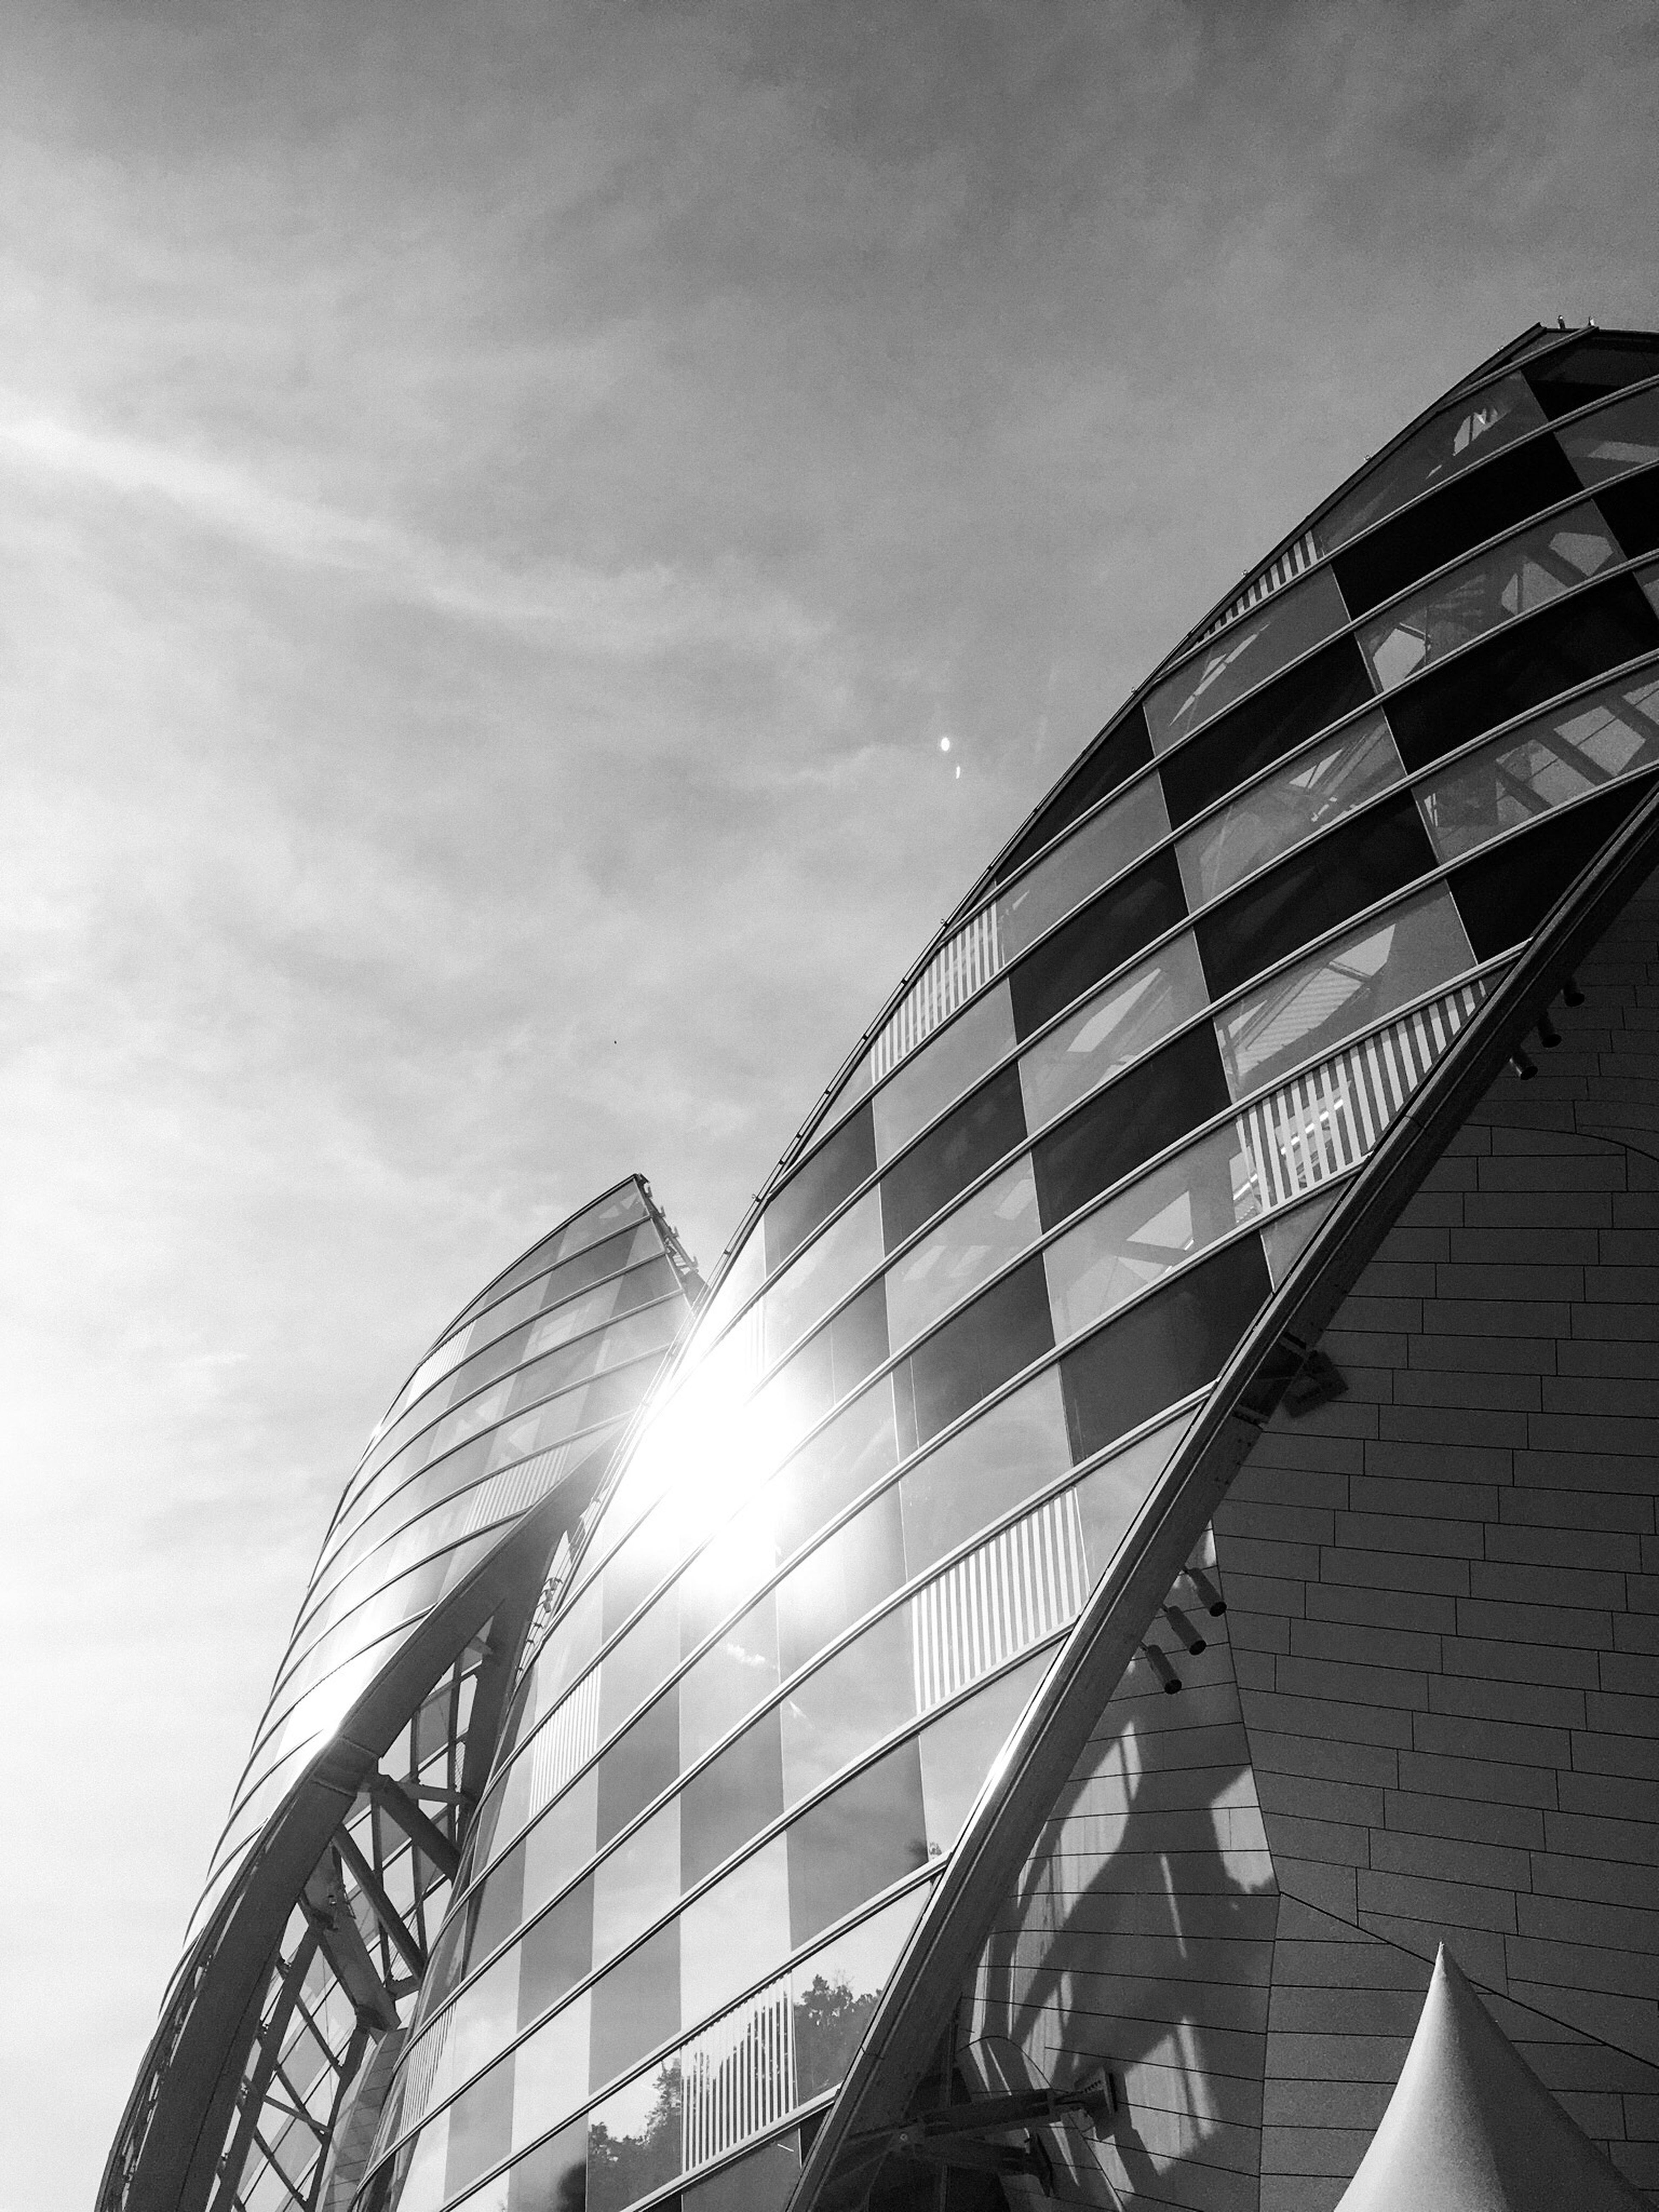 Lvf Fondation Louis Vuitton  Daniel Buren Frank Gehry Sails B&w Architecture B&w Street Photography Paris Fujifilm Fujifilm X-E2 First Eyeem Photo